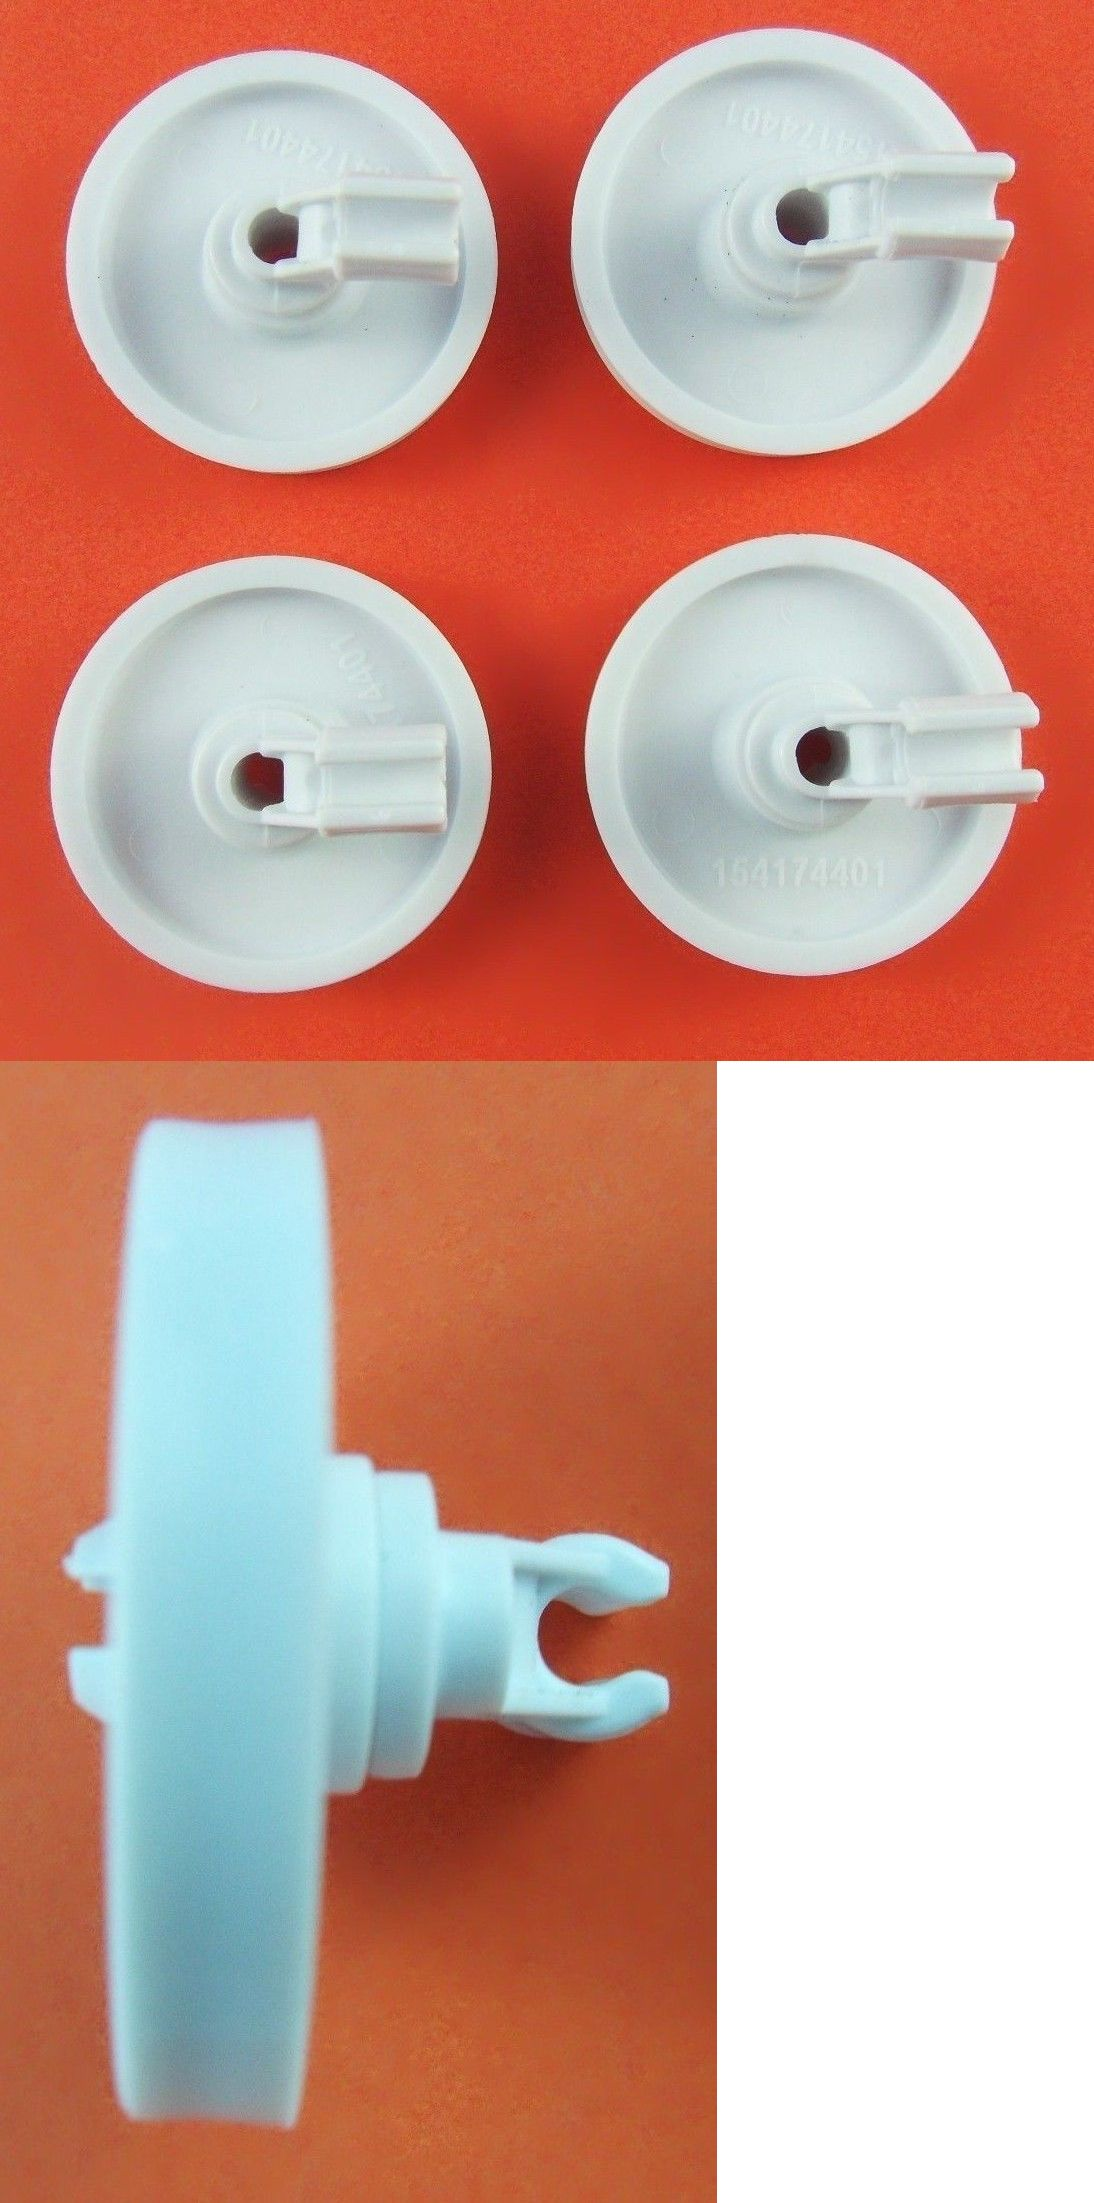 Frigidaire Dishwasher Lower Wheel Part 154174401 154174501 154174502 4 Pack Ebay Frigidaire Dishwasher Dishwasher Parts Frigidaire